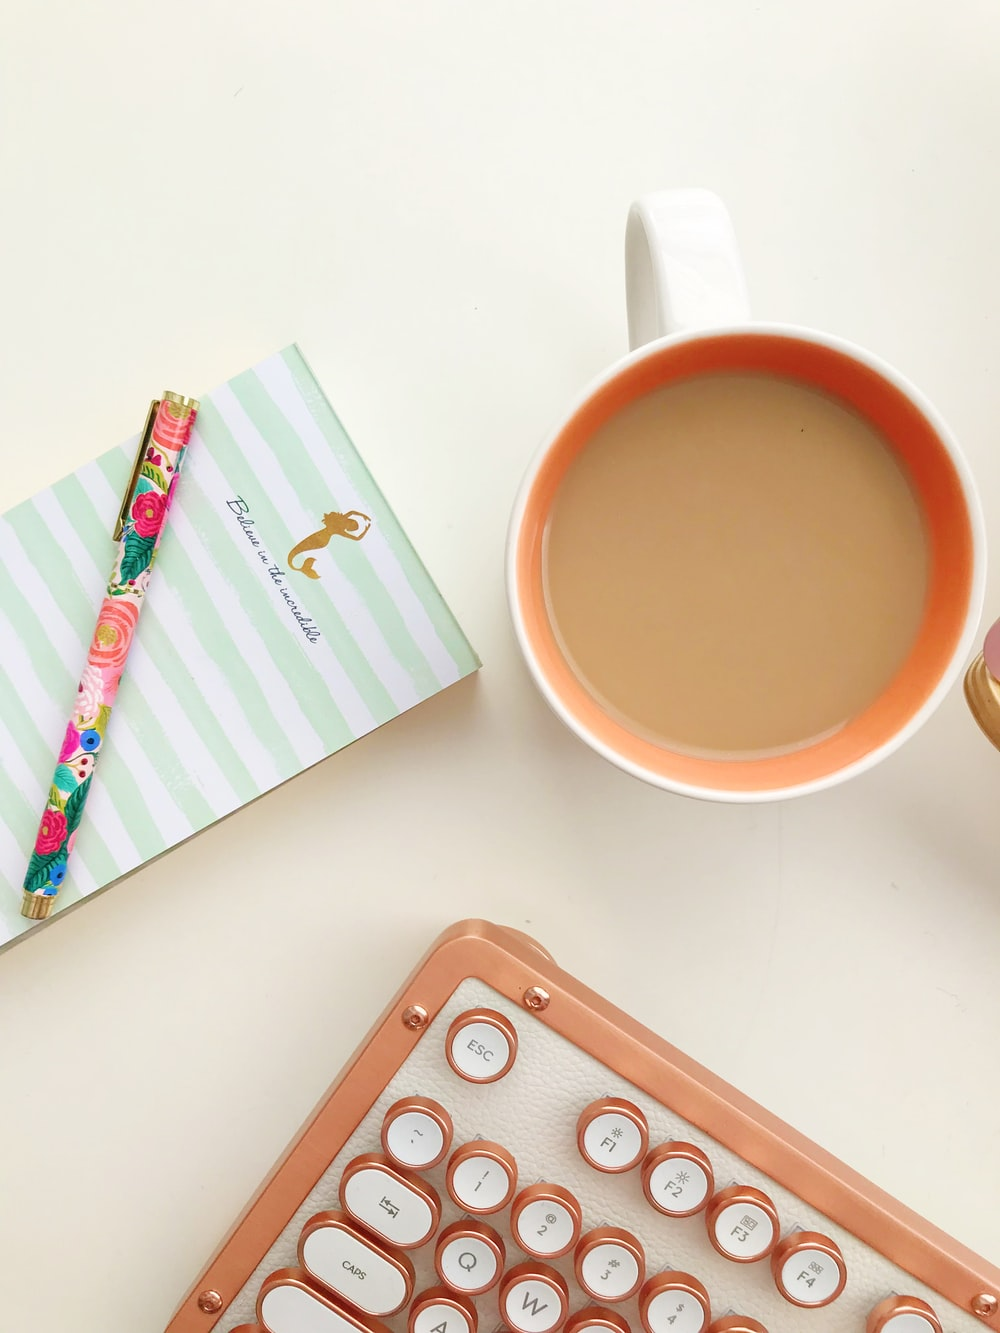 white and orange mug beside pen